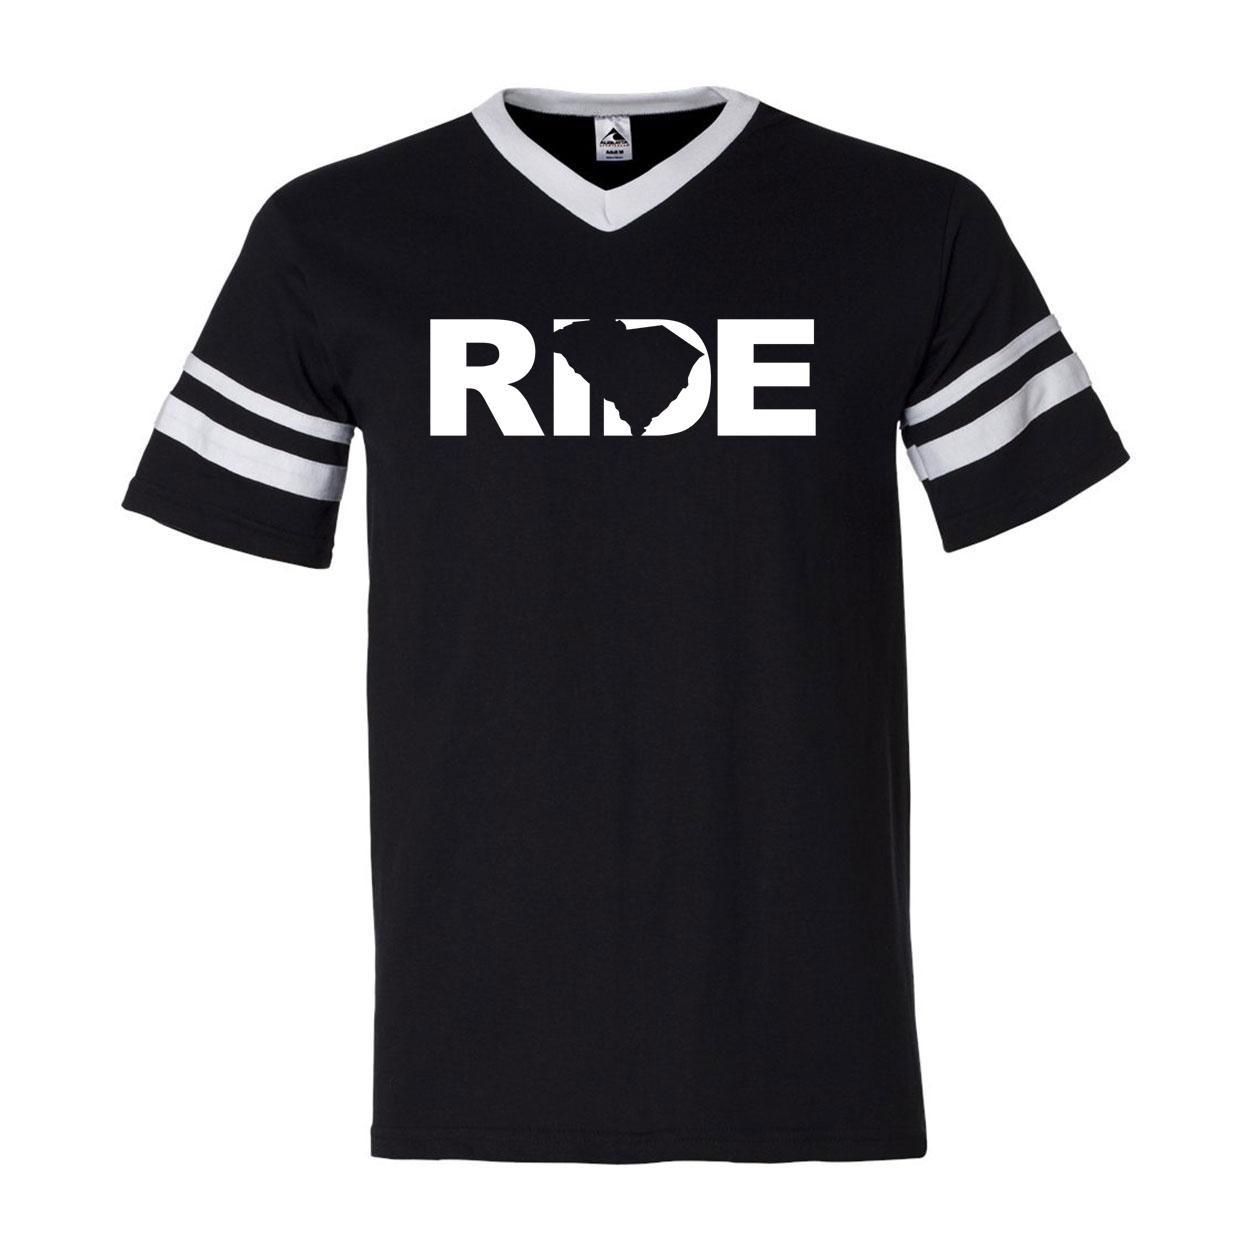 Ride South Carolina Classic Premium Striped Jersey T-Shirt Black/White (White Logo)